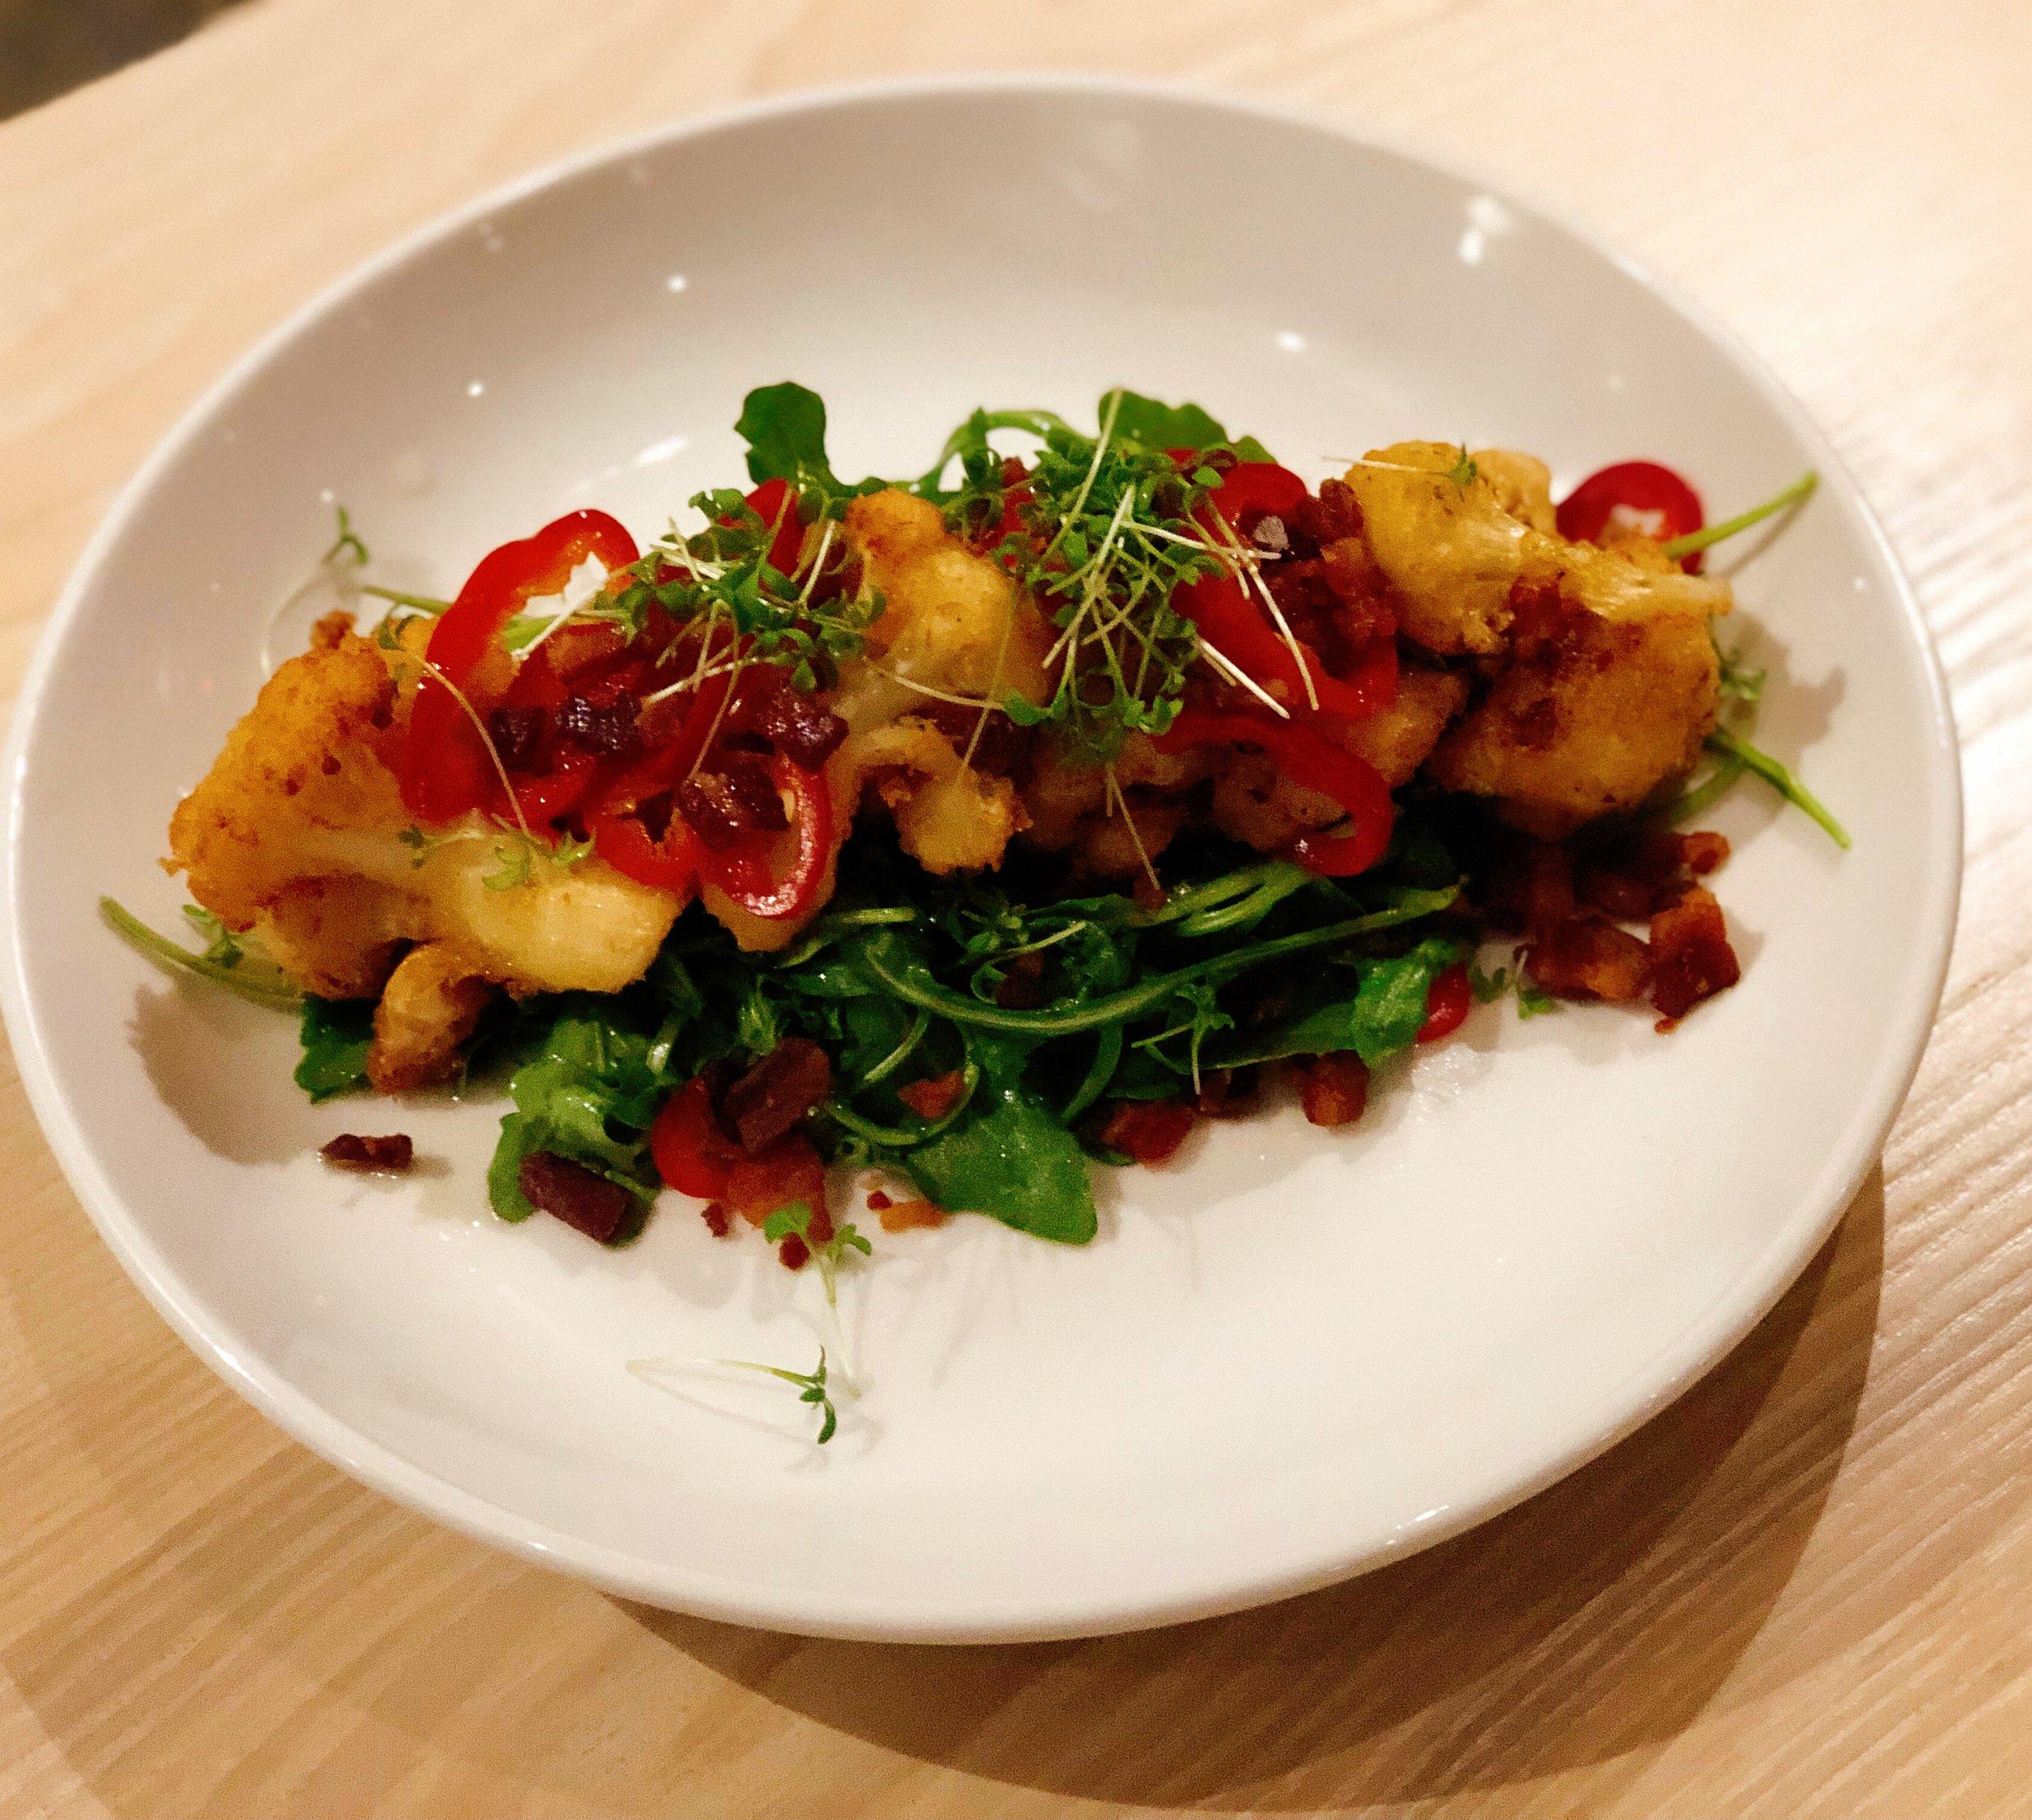 Fried Cauliflower | Gifford's Bacon + Greens + Orange + Fresno